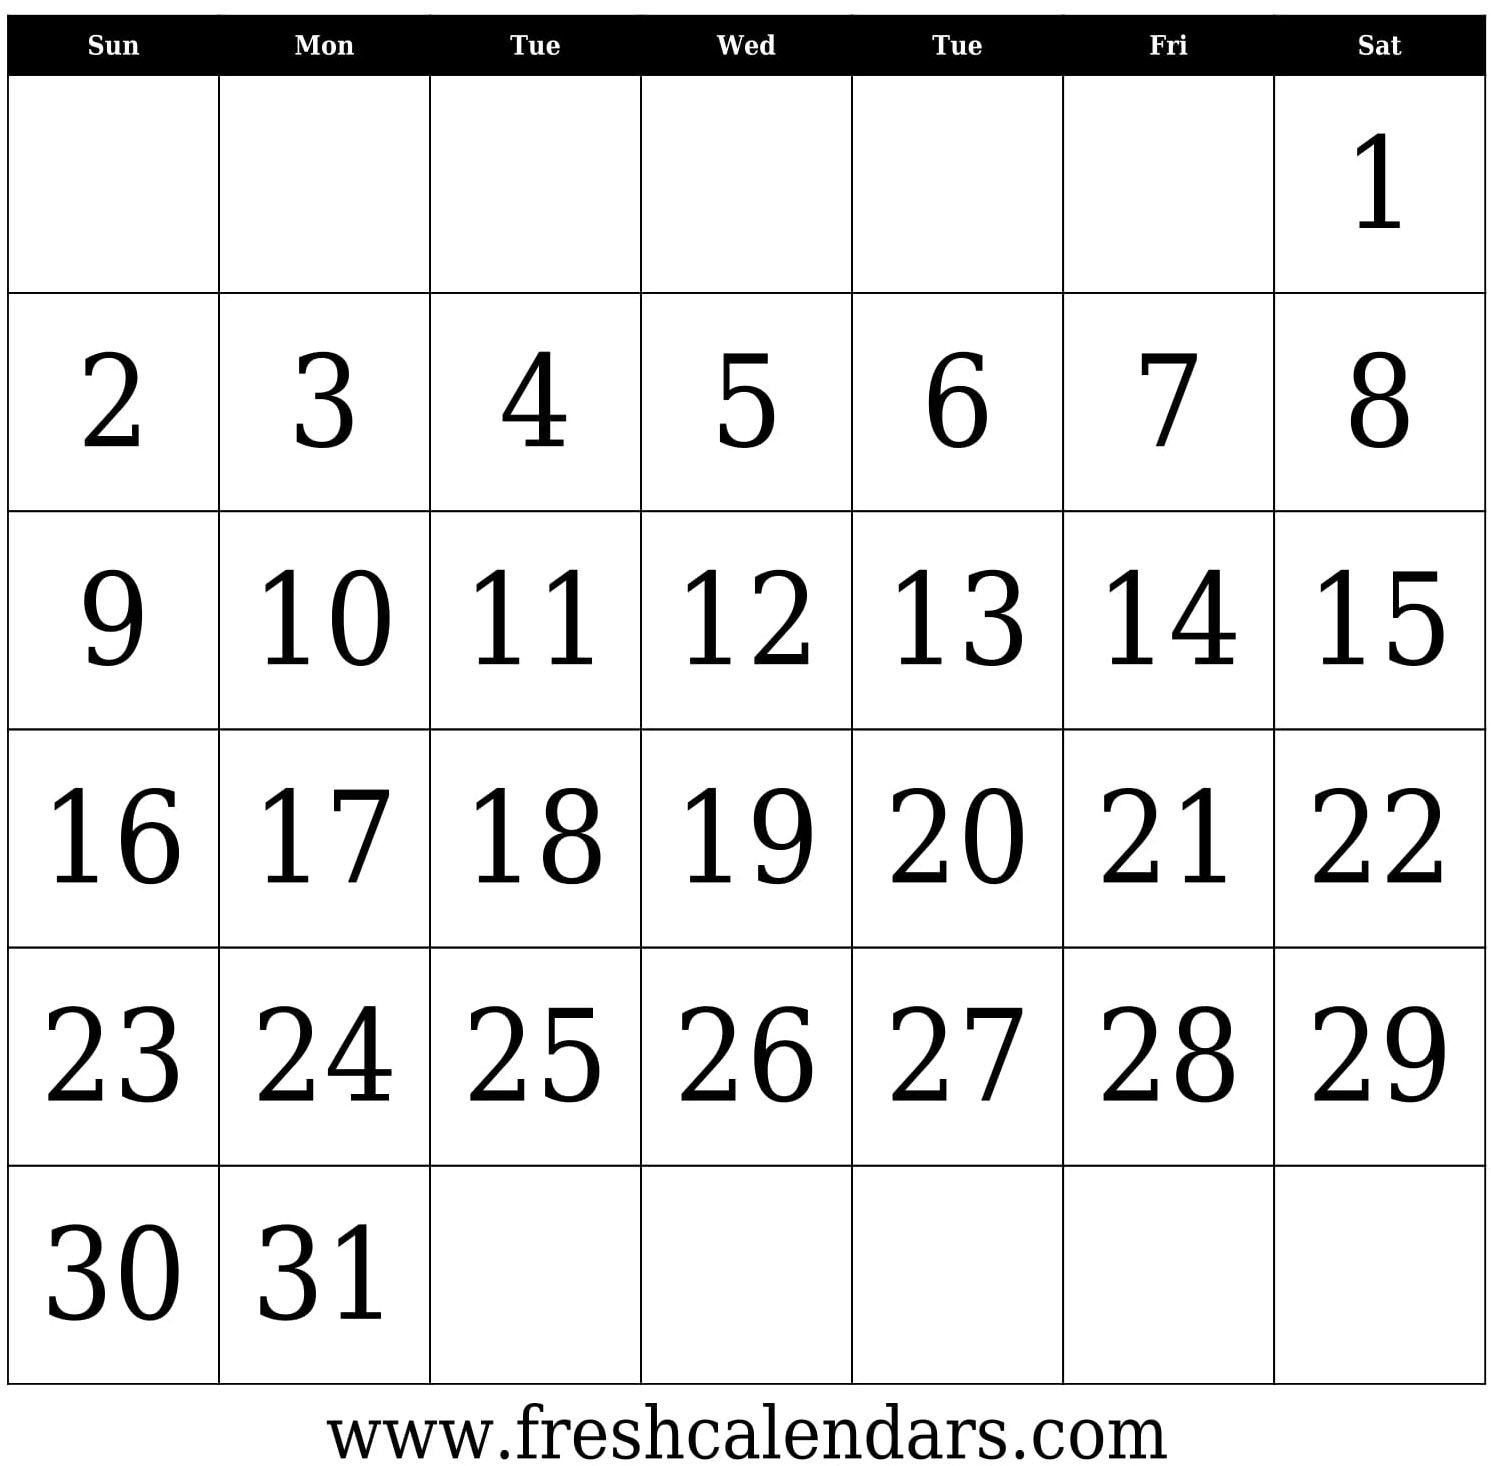 Calendar Template 31 Days In 2020 | Blank Calendar Template